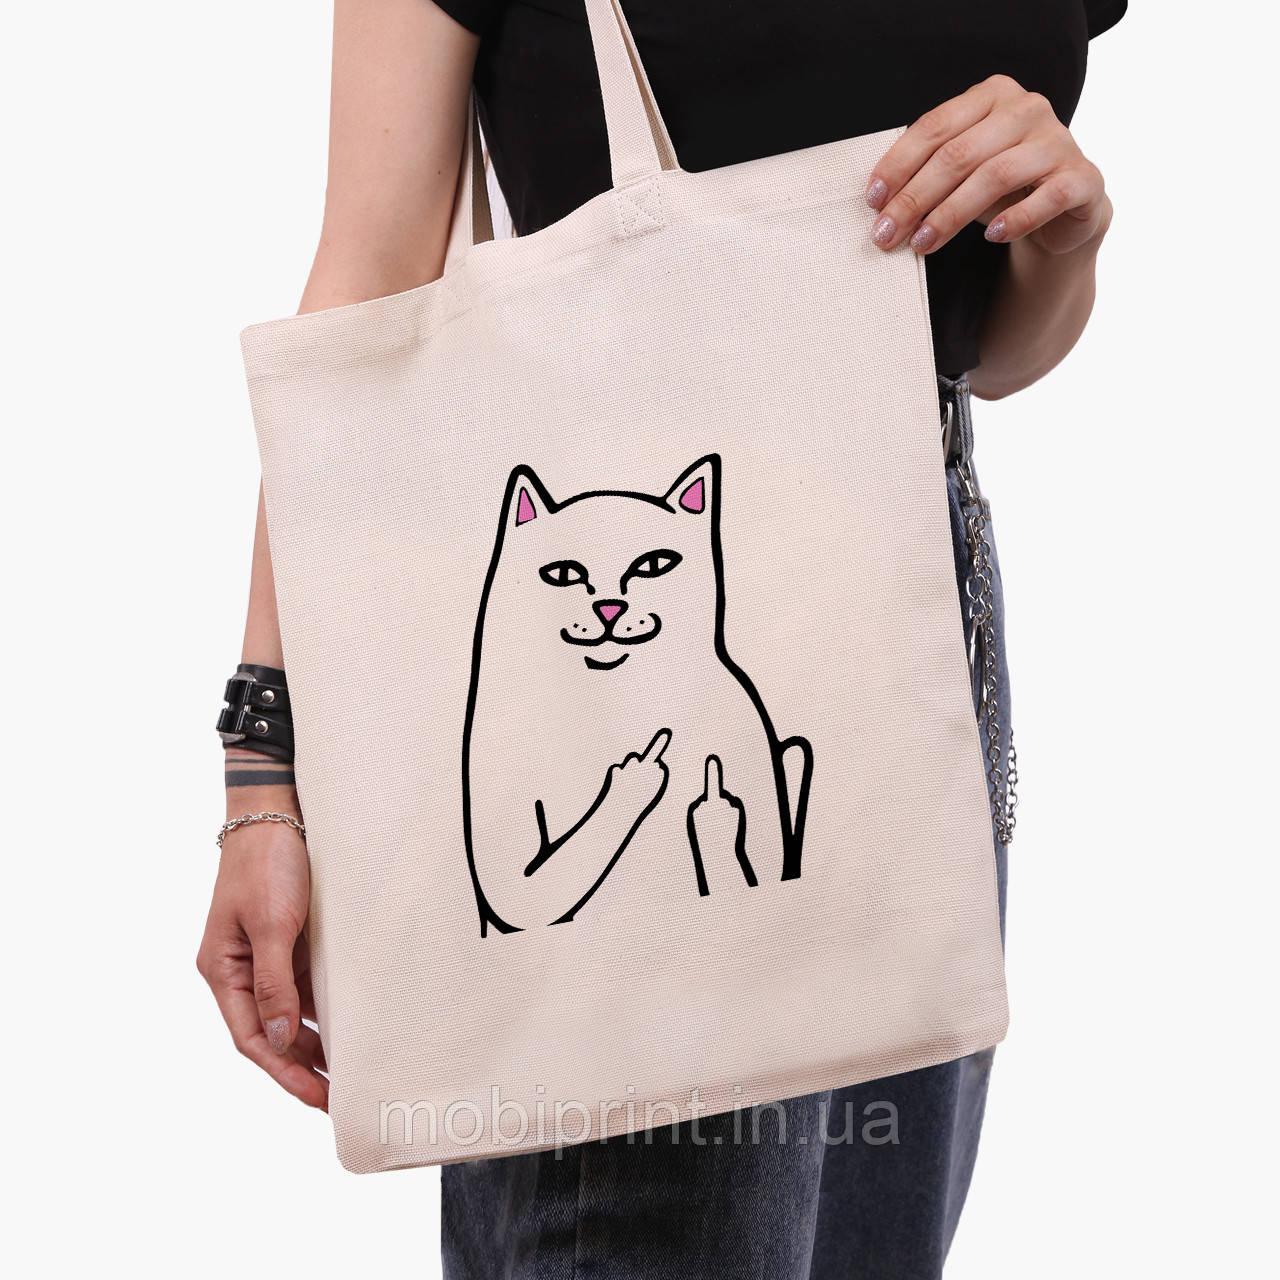 Эко сумка шоппер мем Белый Кот с пальцем (meme Cat Middle finger) (9227-2851)  41*35 см